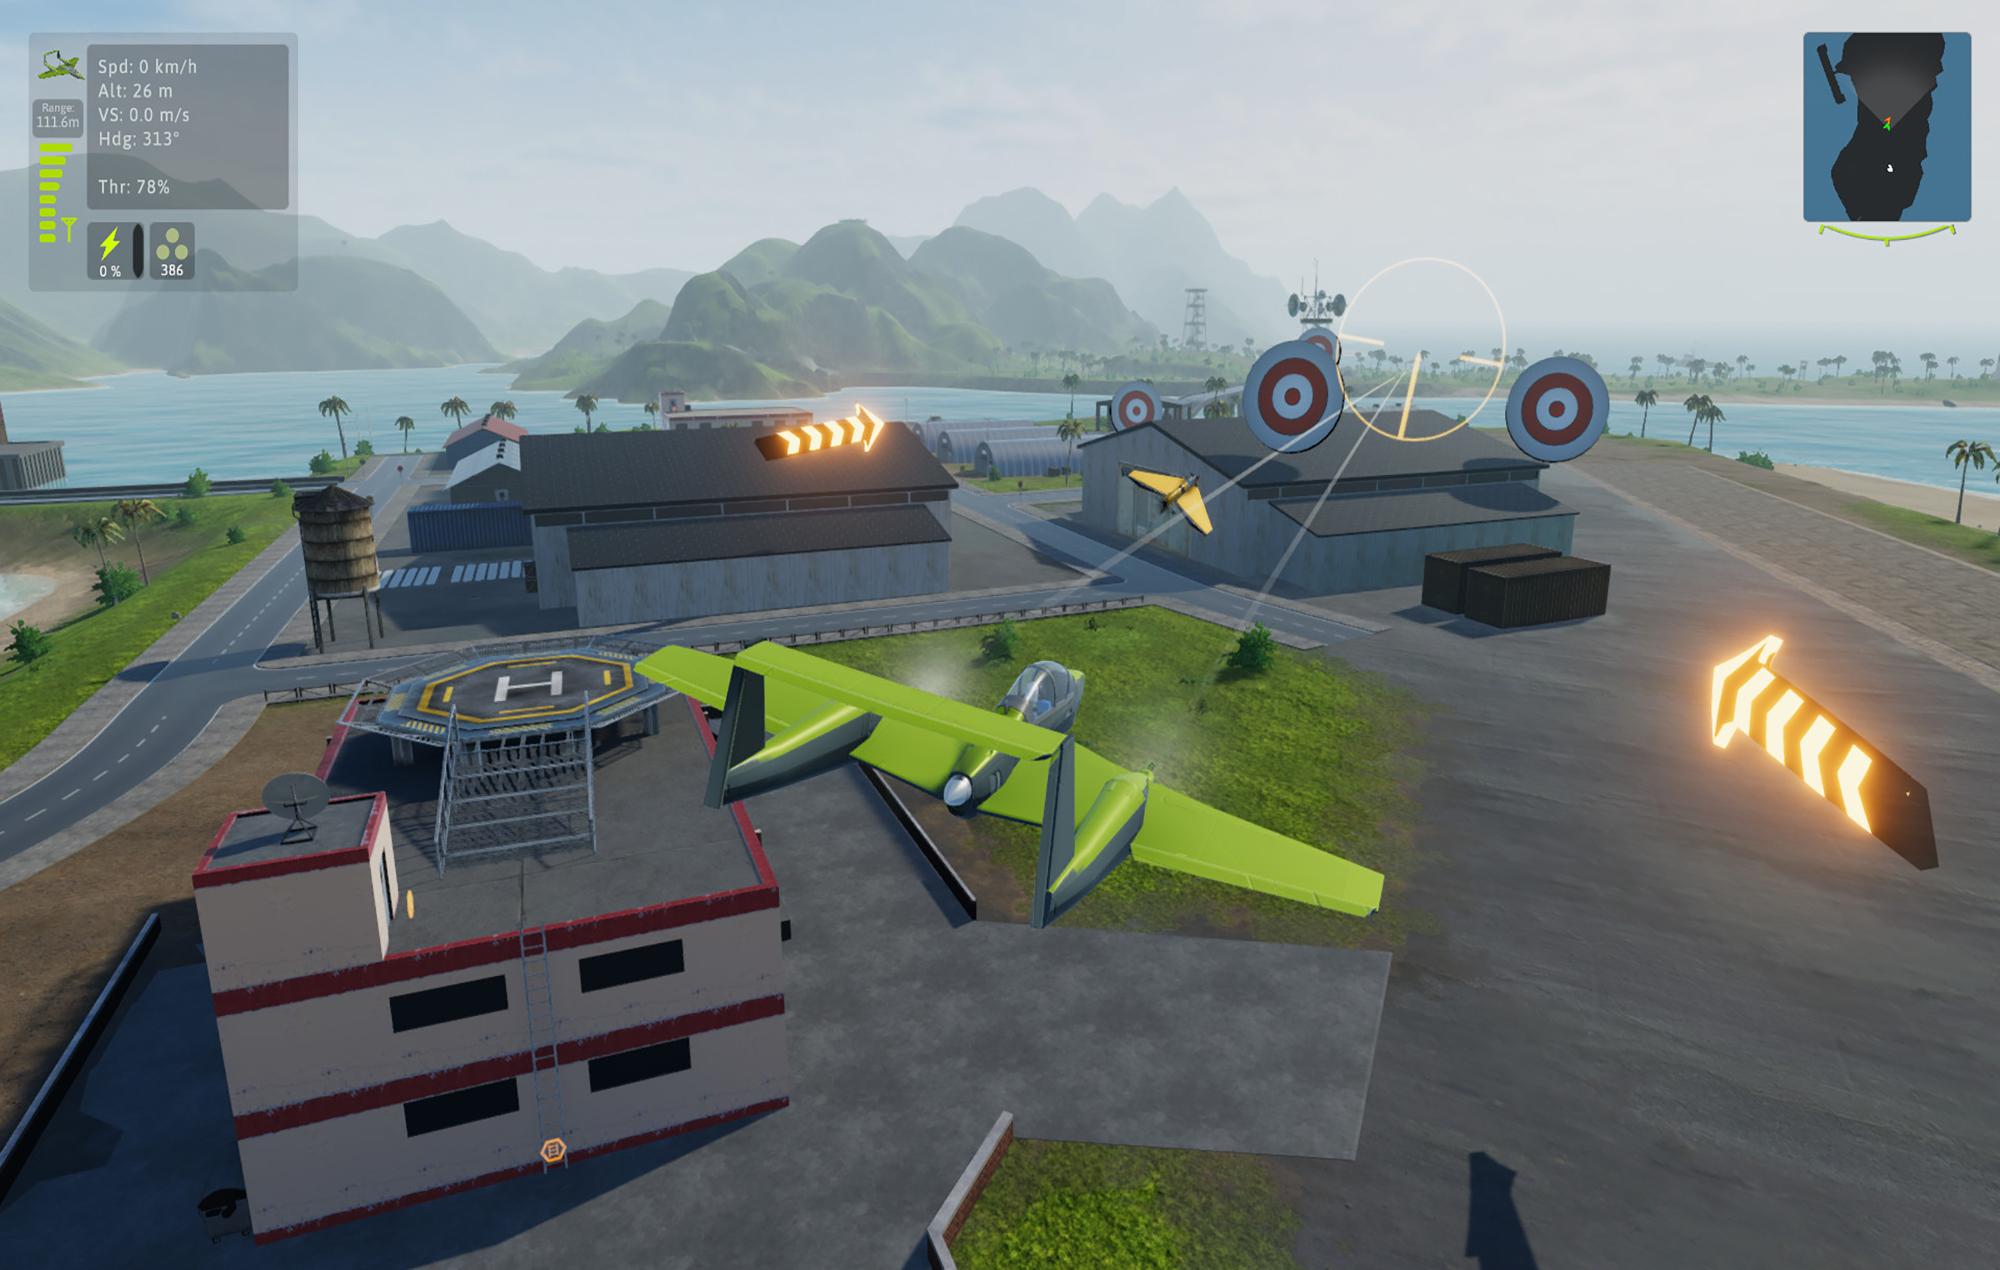 Balsa Model Flight Sim. Image credit: Floating Origin Interactive